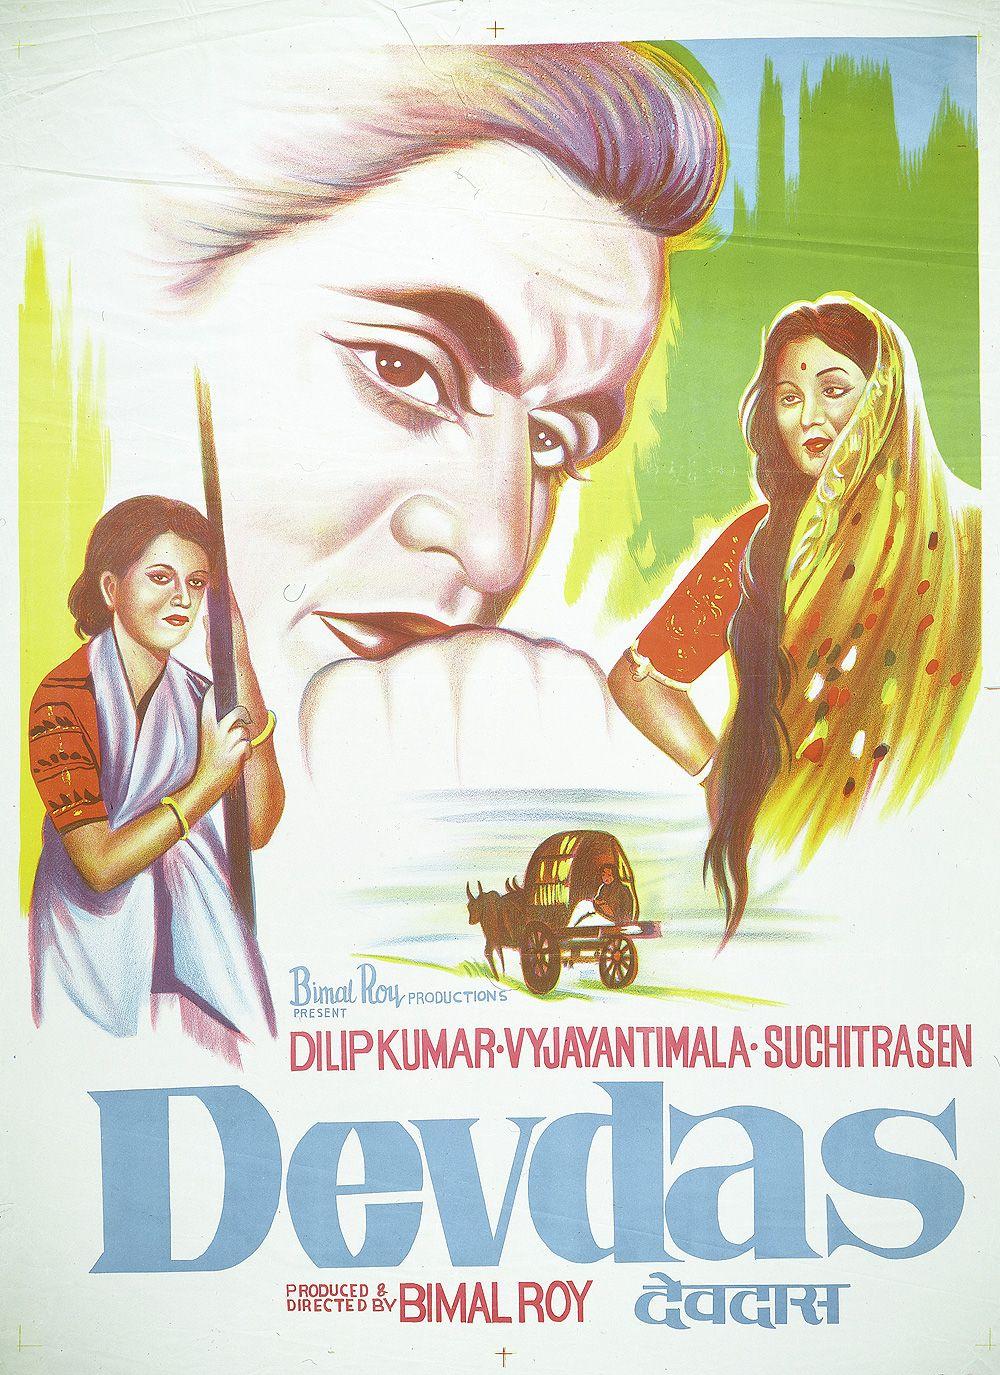 devdas 1955 dilip kumar classic indian bollywood